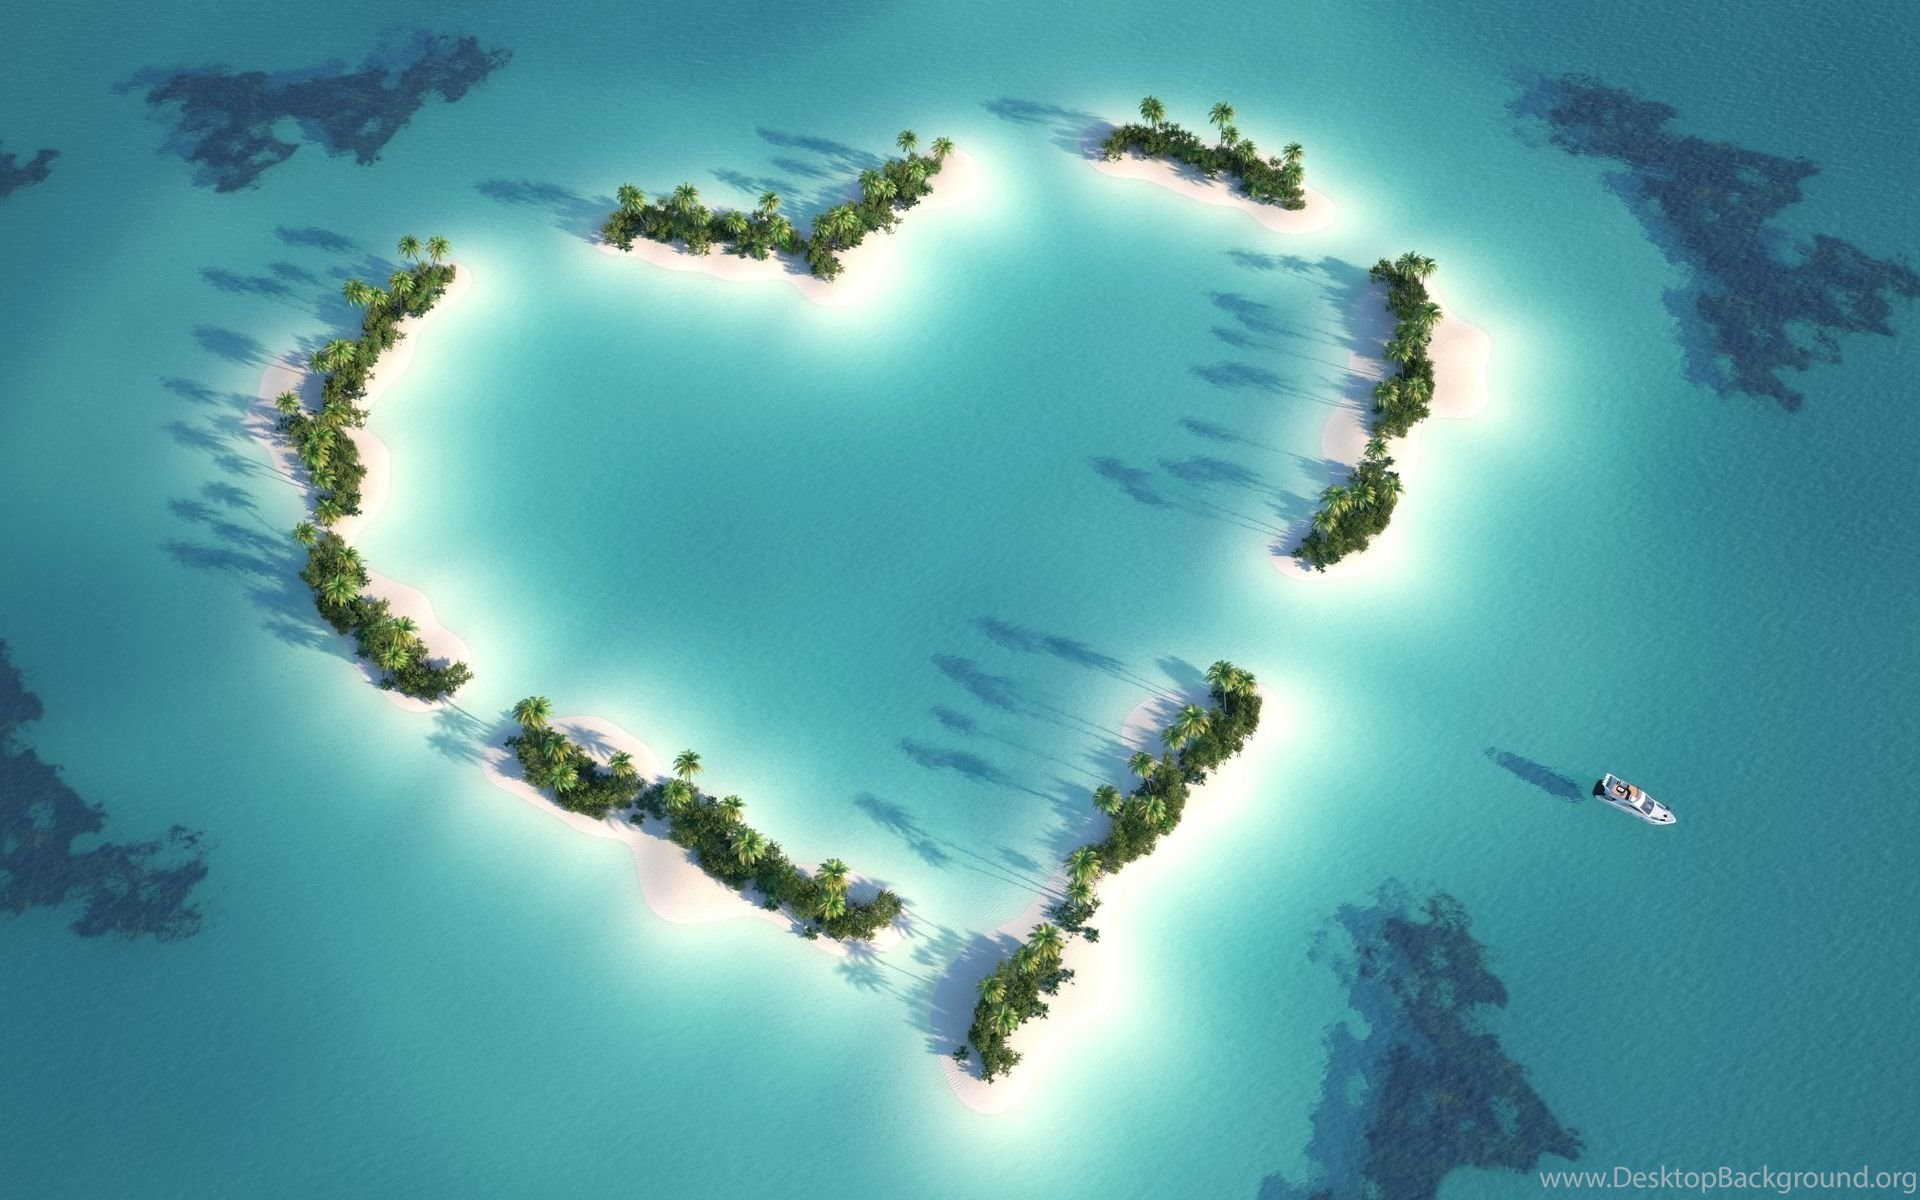 beautiful love island view hd wallpapers for desktop desktop background